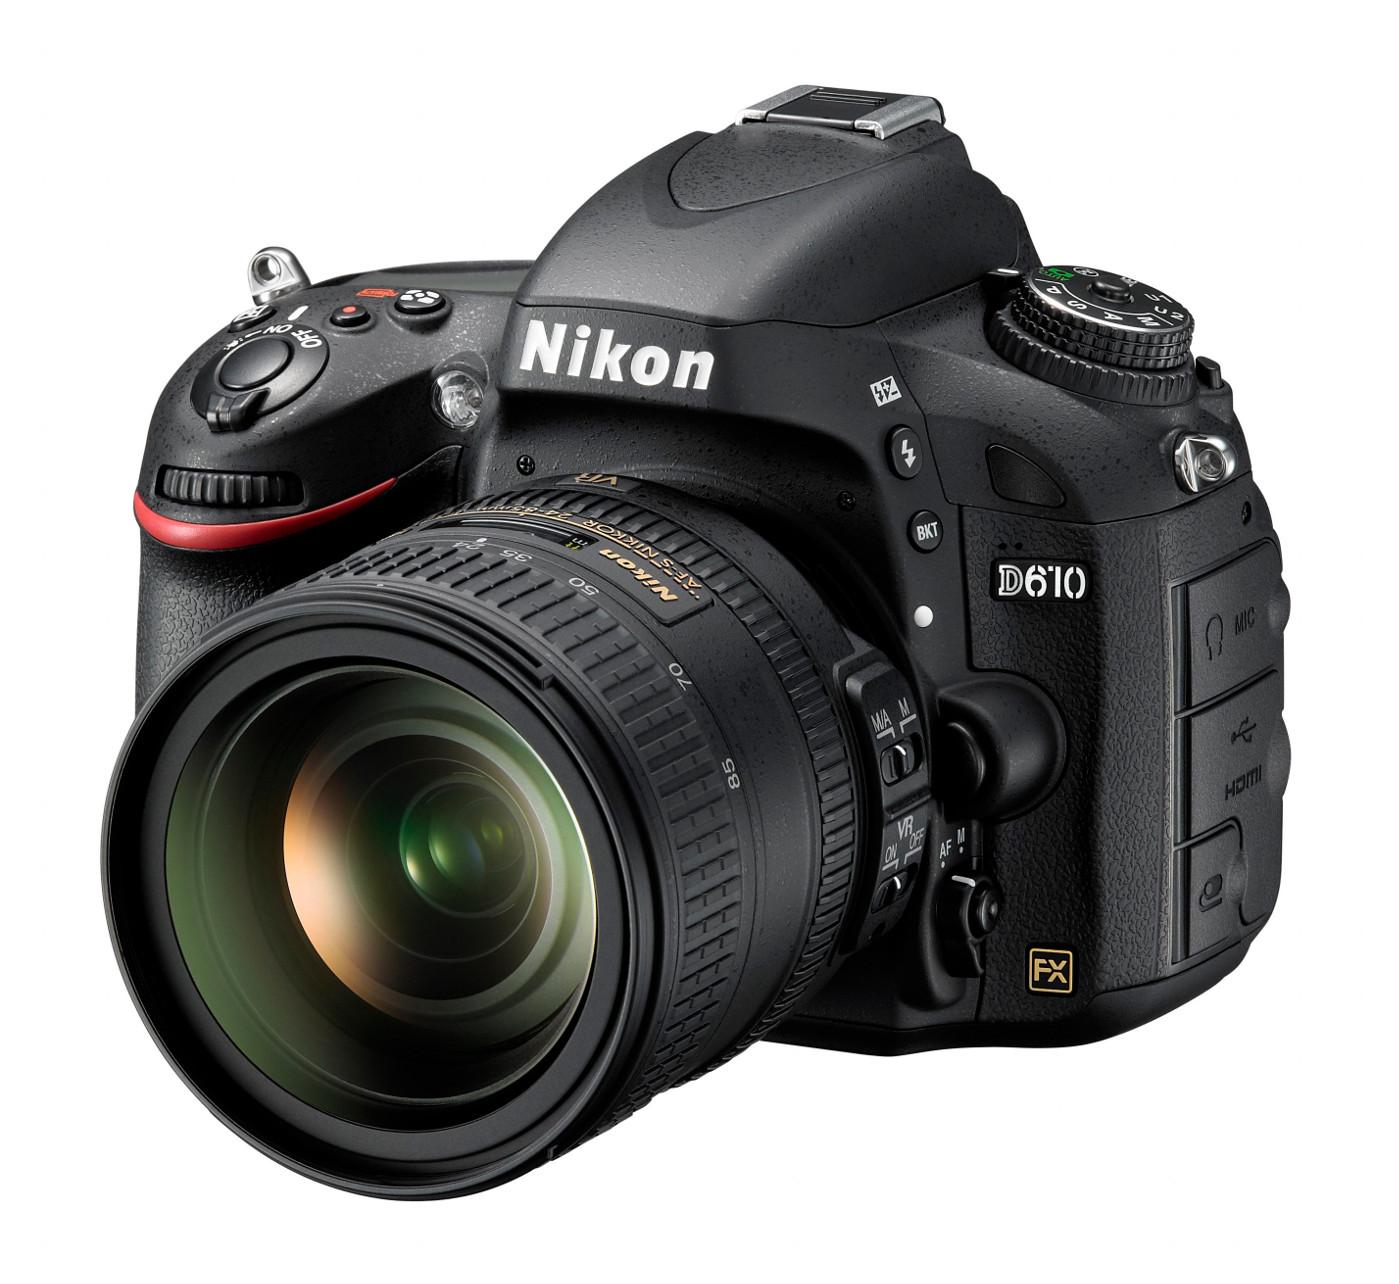 Nikon D610 arriva la nuova digitale full frame